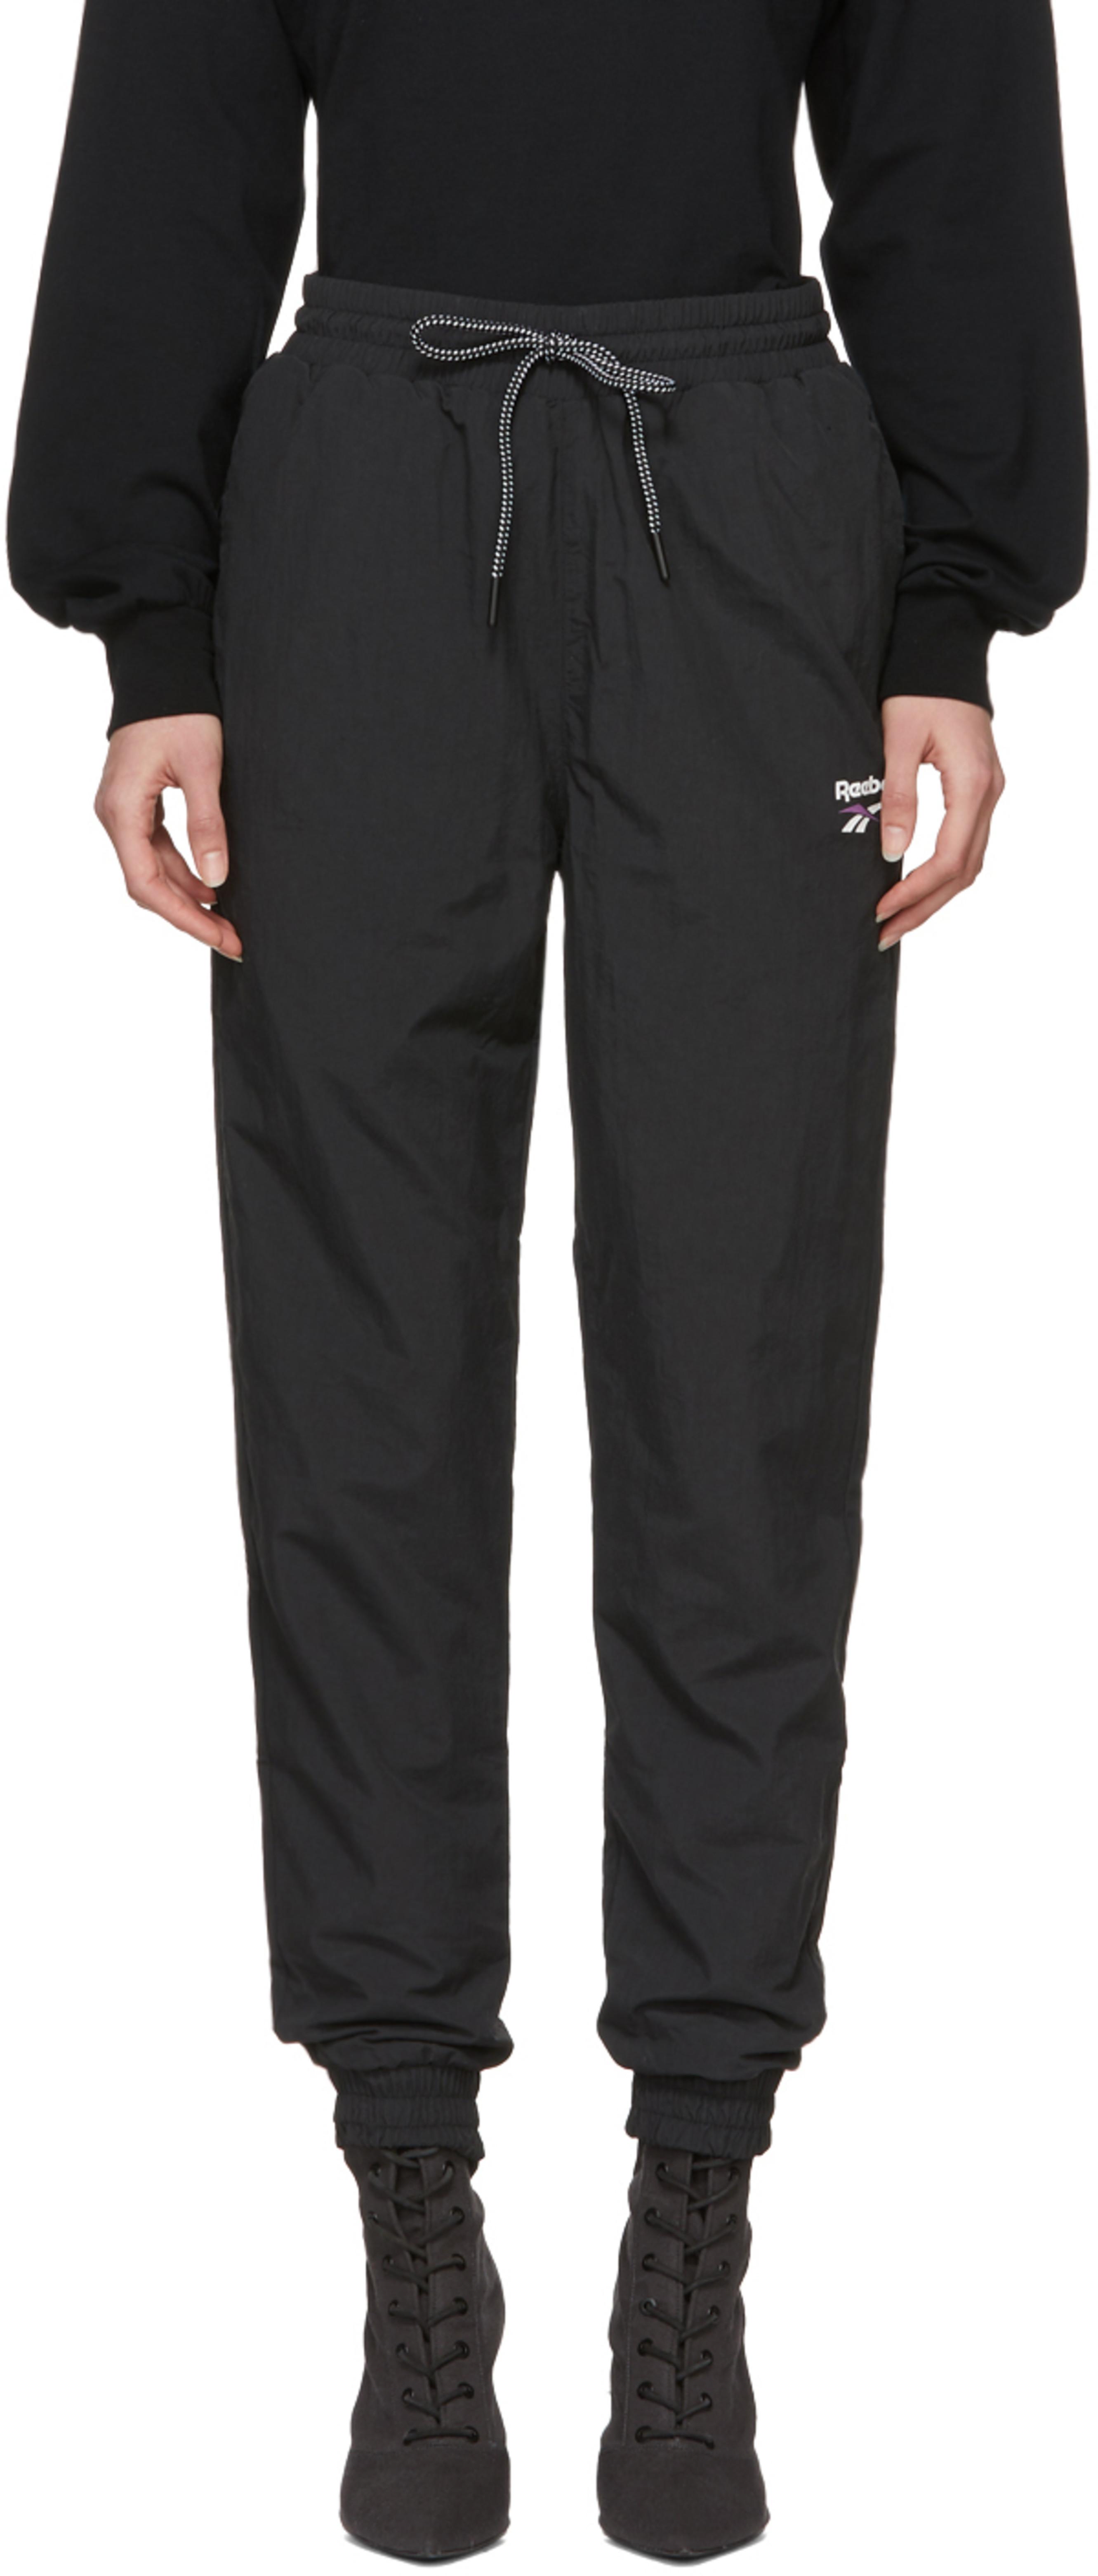 9a6310d97f96 Designer lounge pants for Women